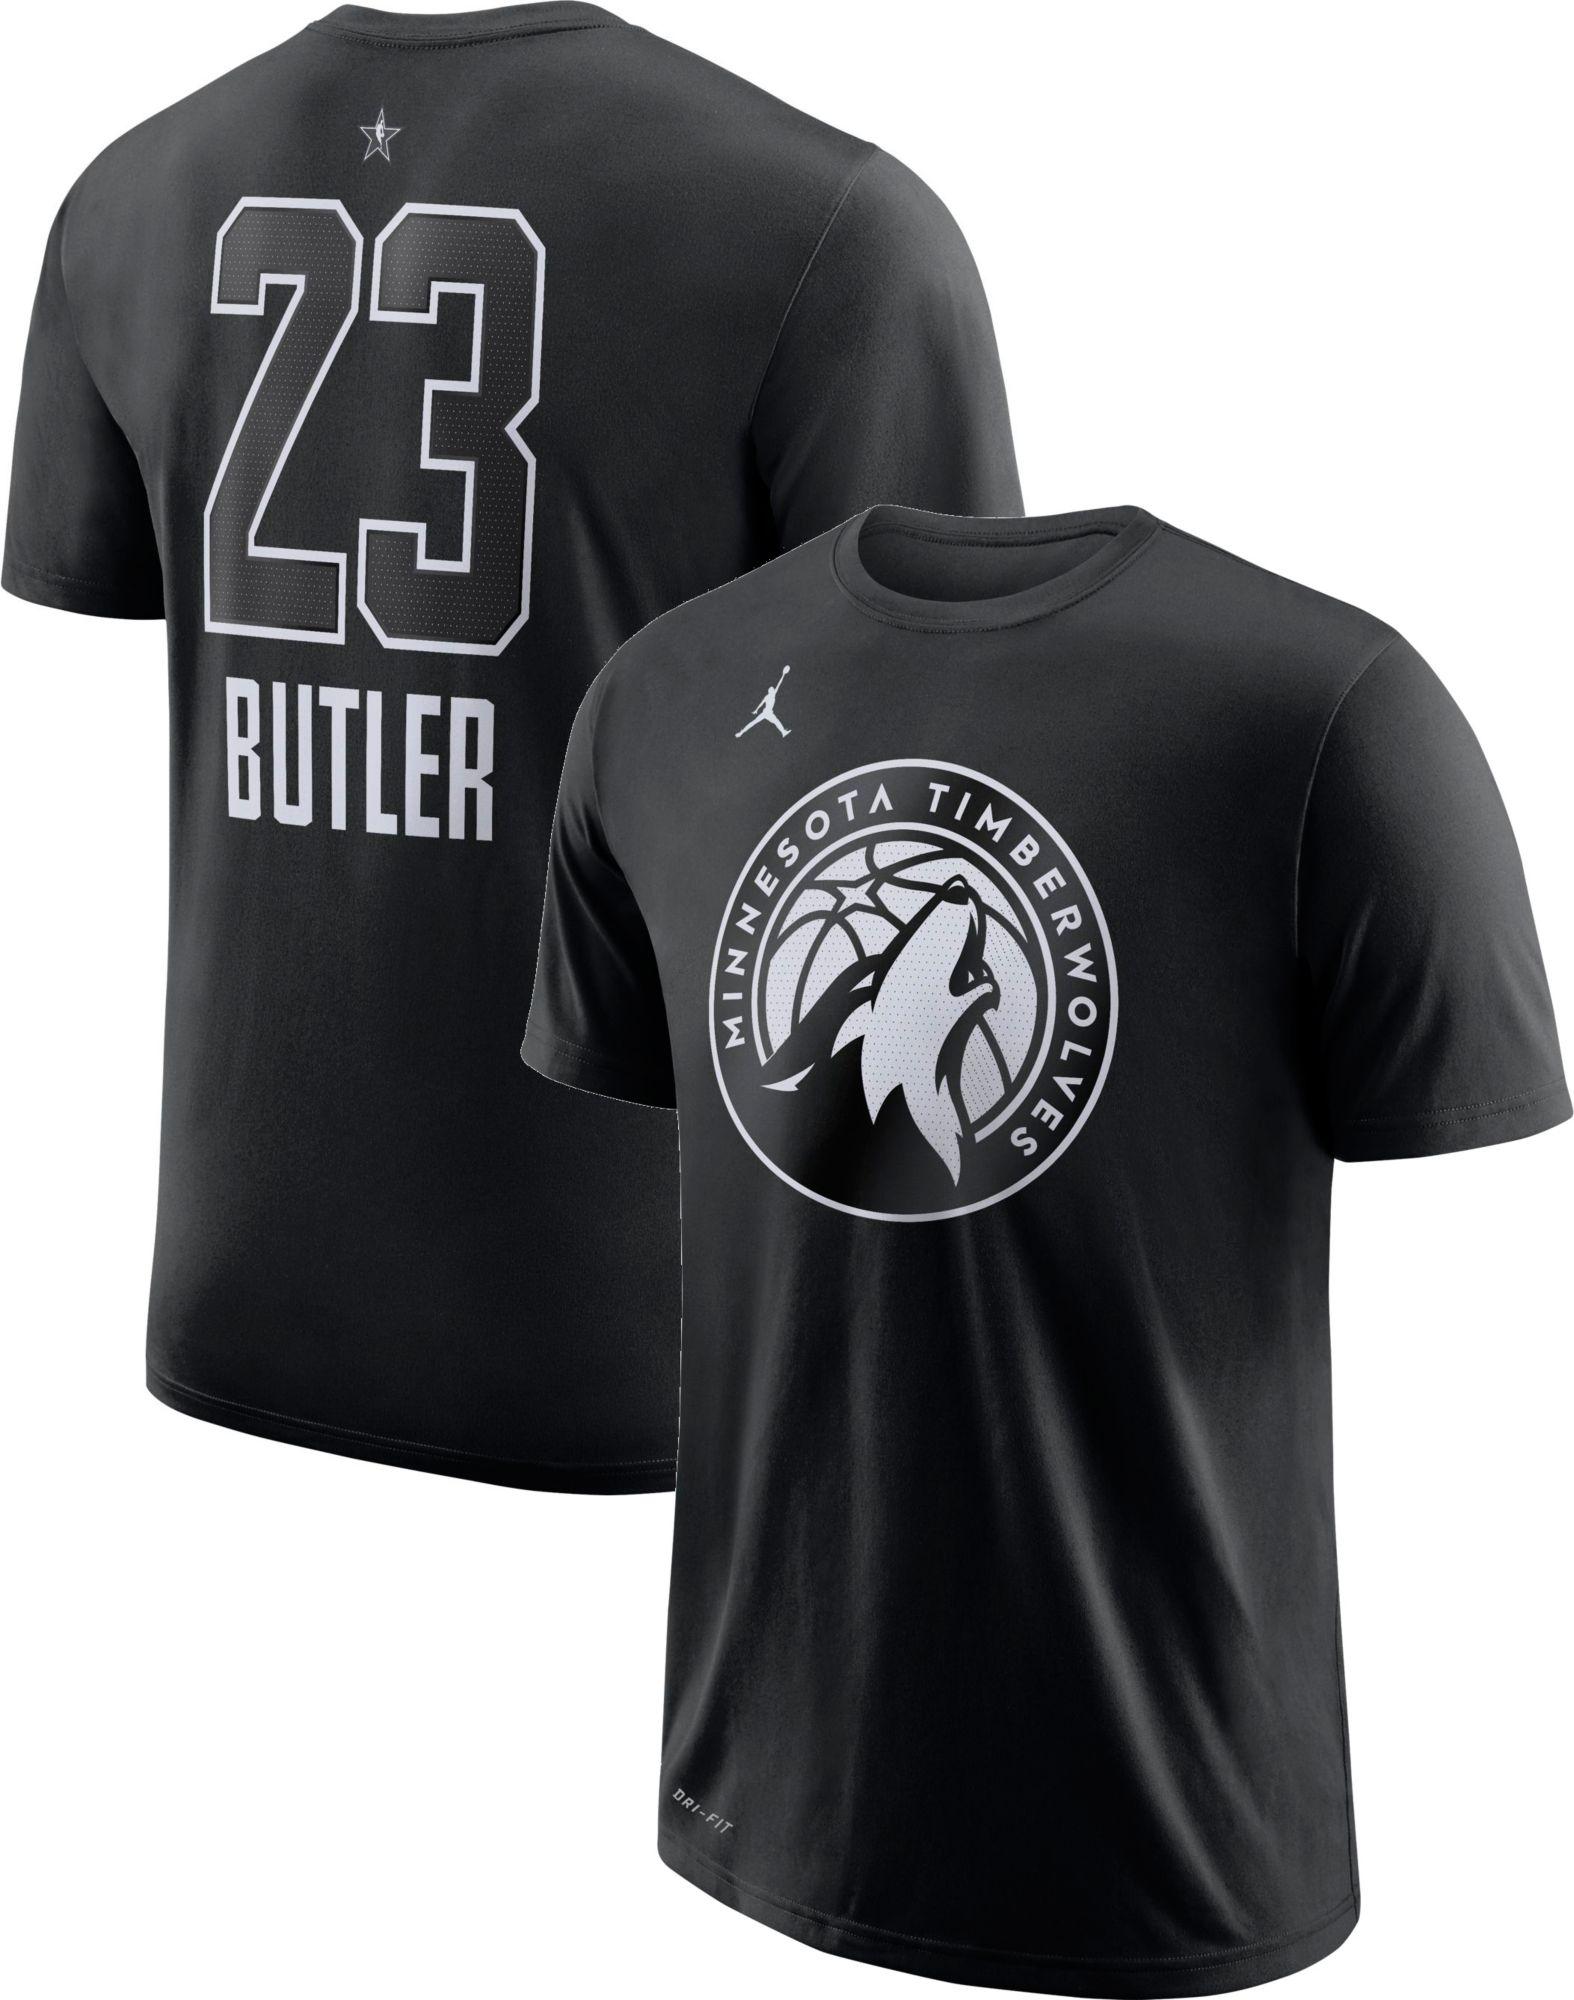 new product 23a33 86926 australia jimmy butler sleeve jersey ce4b5 c030b